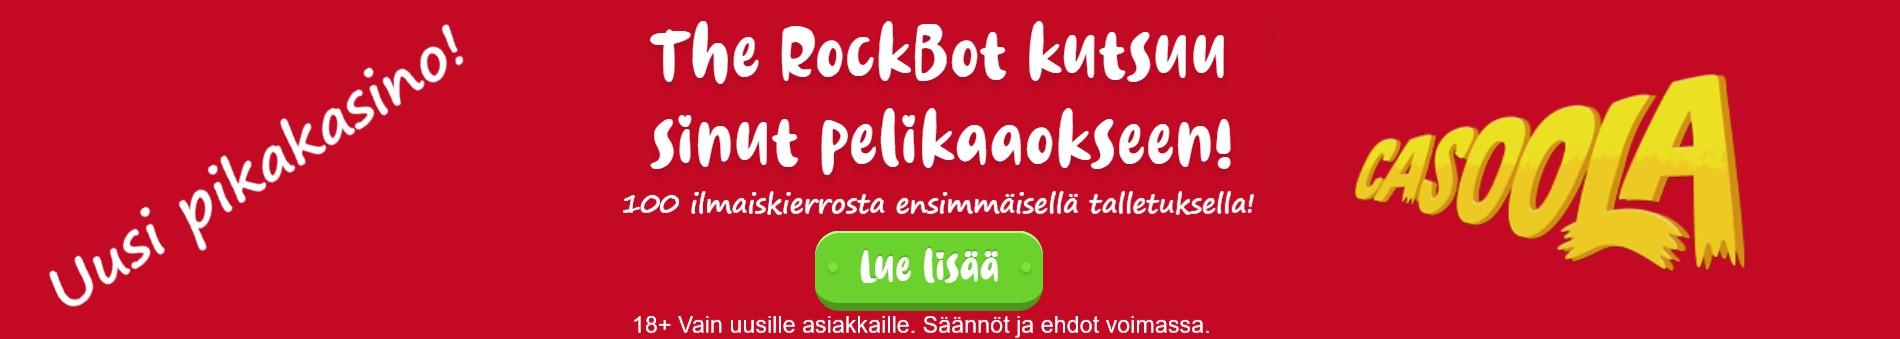 casoola_slider